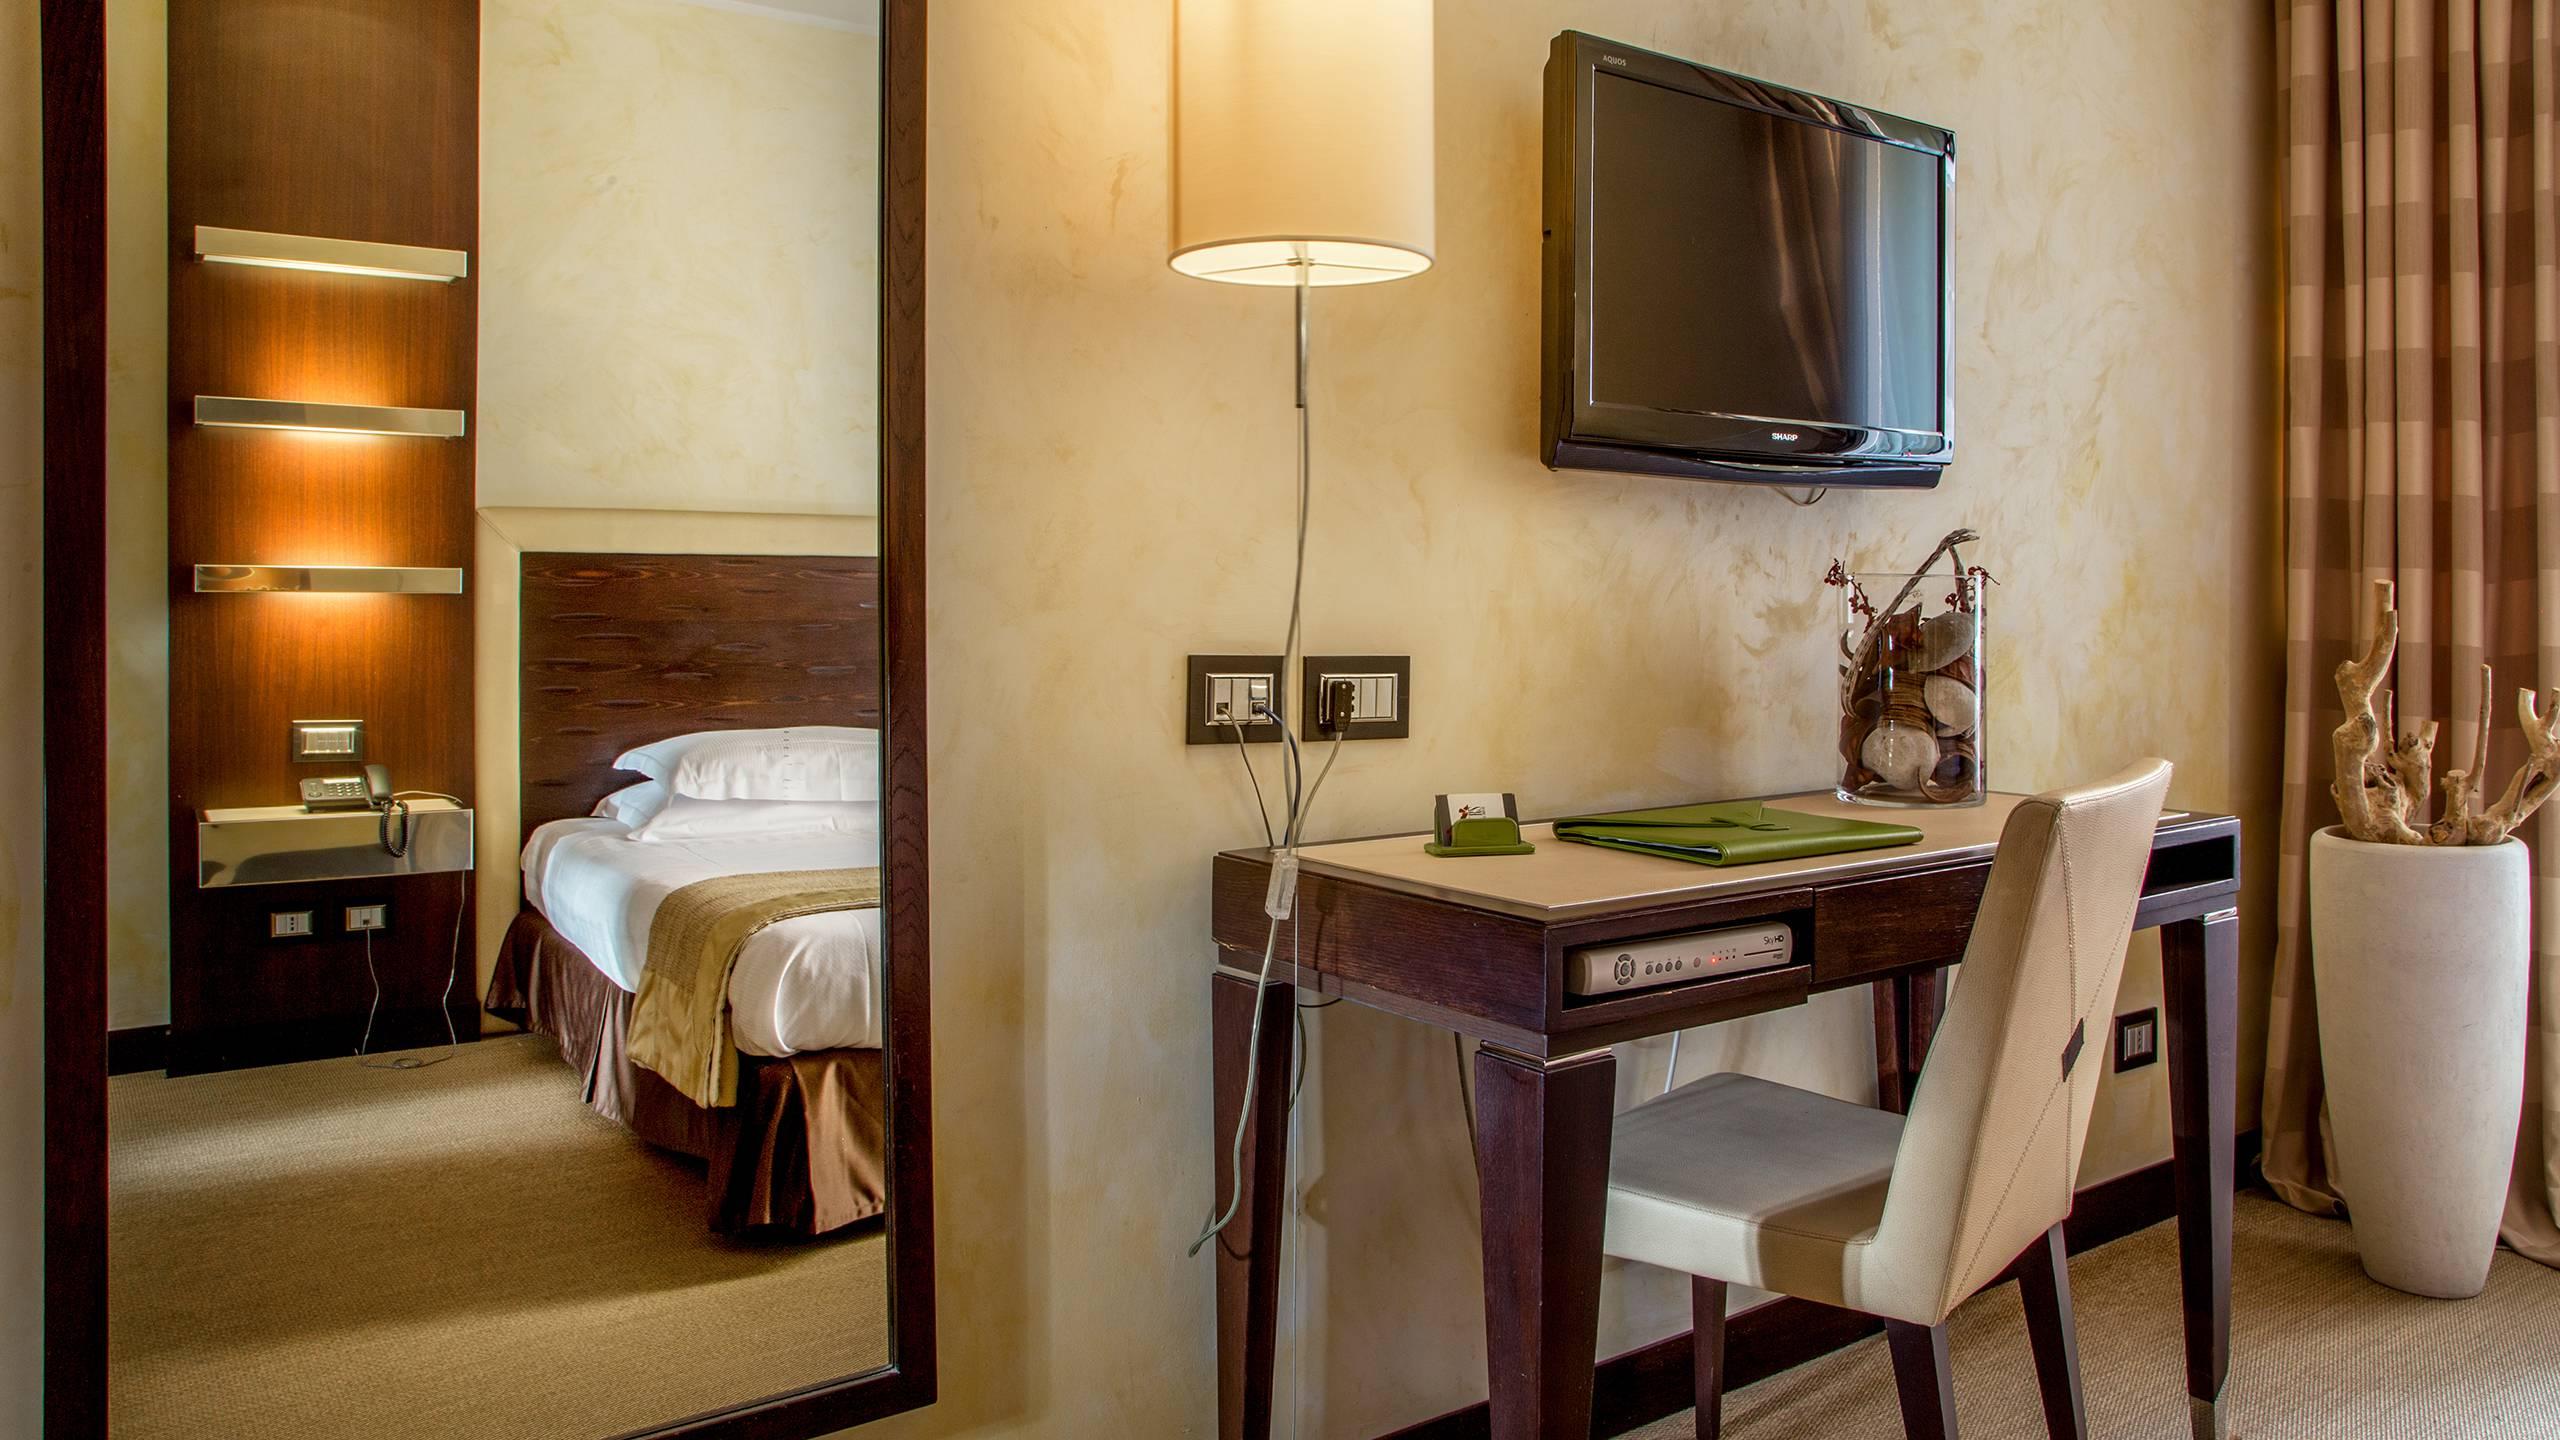 09-Les-Fleurs-Luxury-House-Rome-room